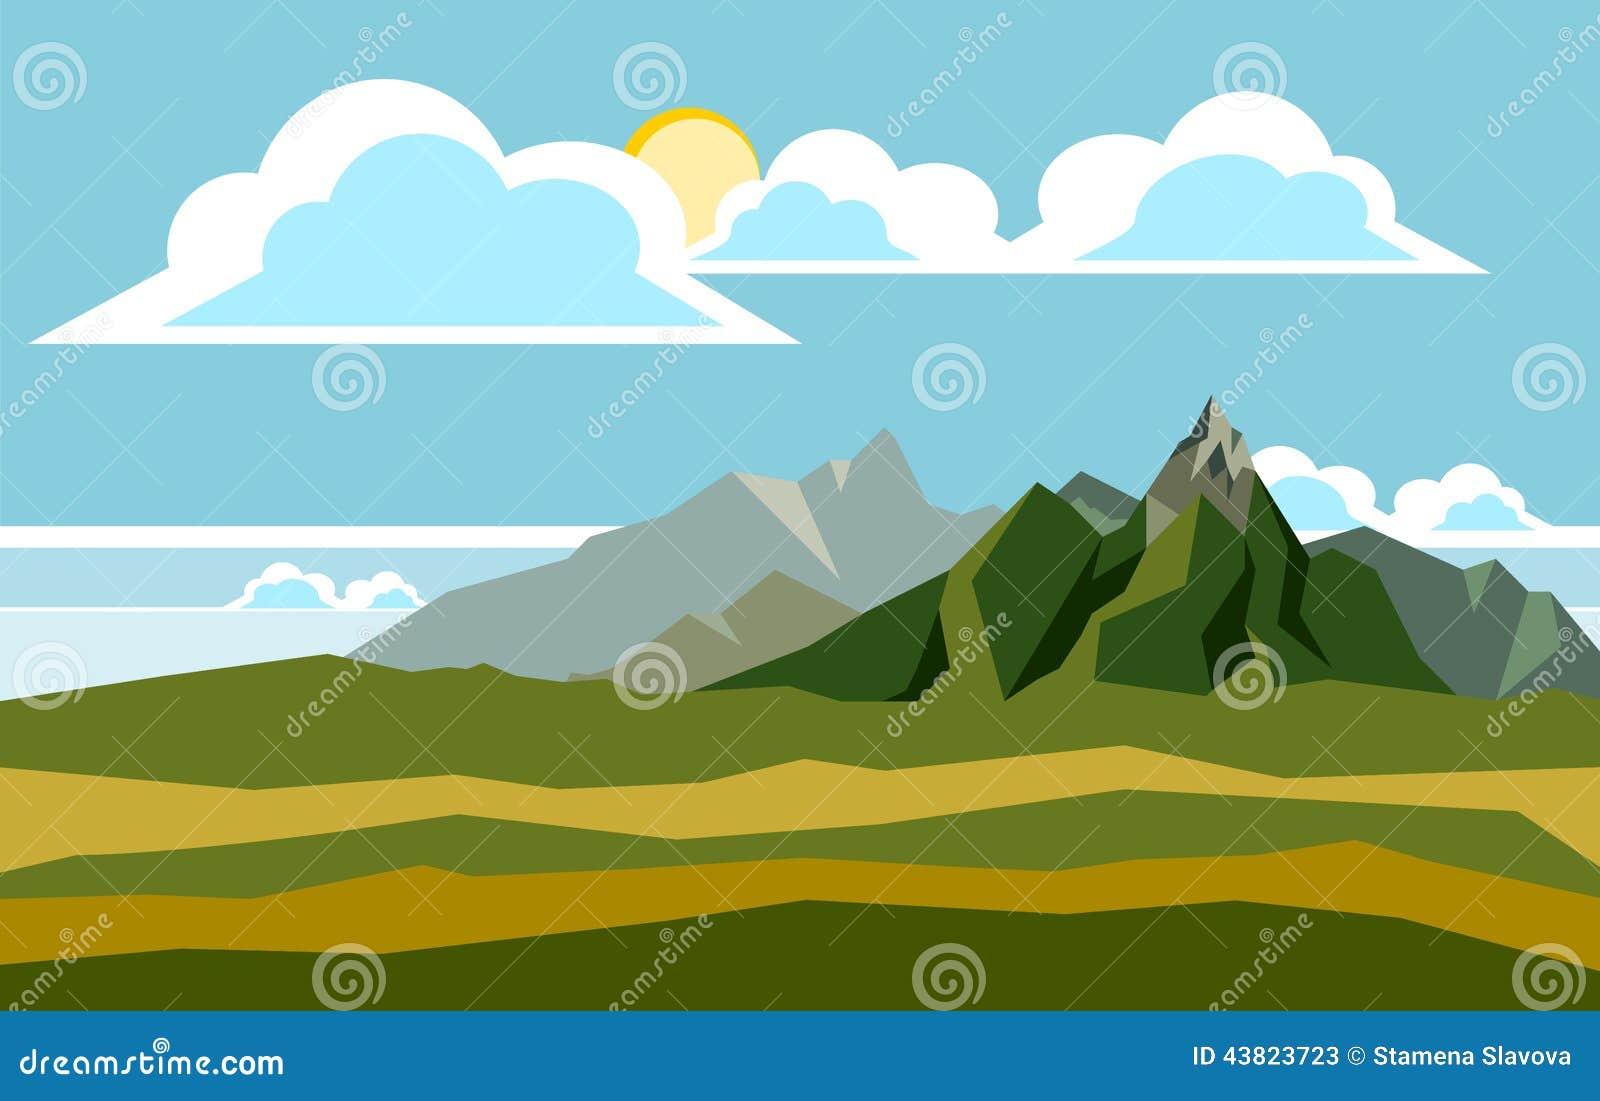 Landscape Illustration Vector Free: Mountain Landscape Illustration Stock Vector